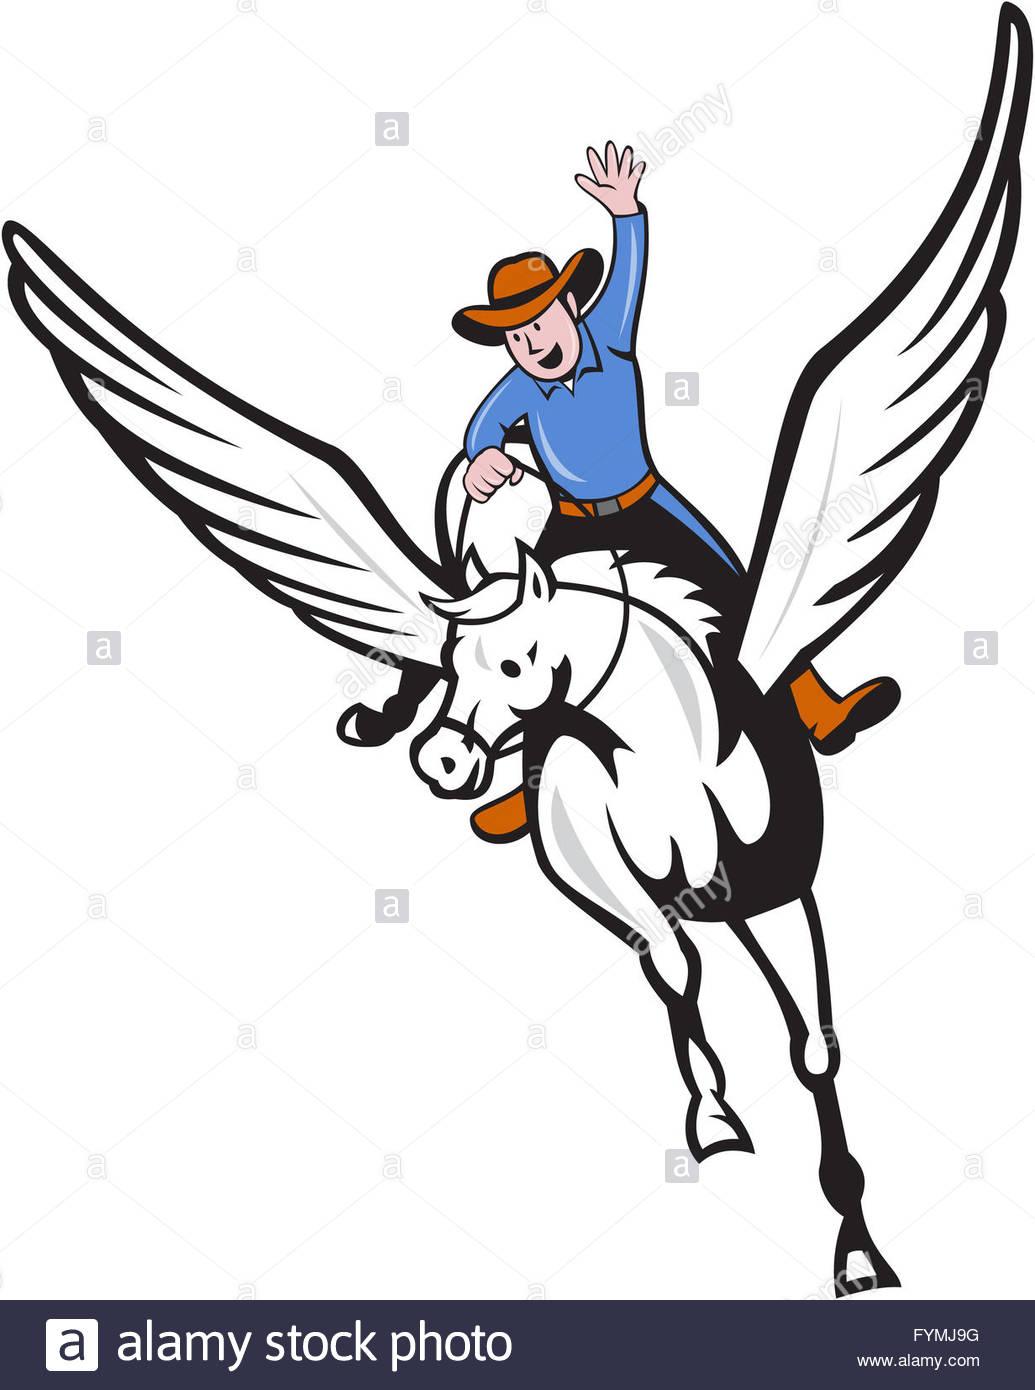 1035x1390 Cowboy Riding Pegasus Flying Horse Cartoon Stock Photo 103100972